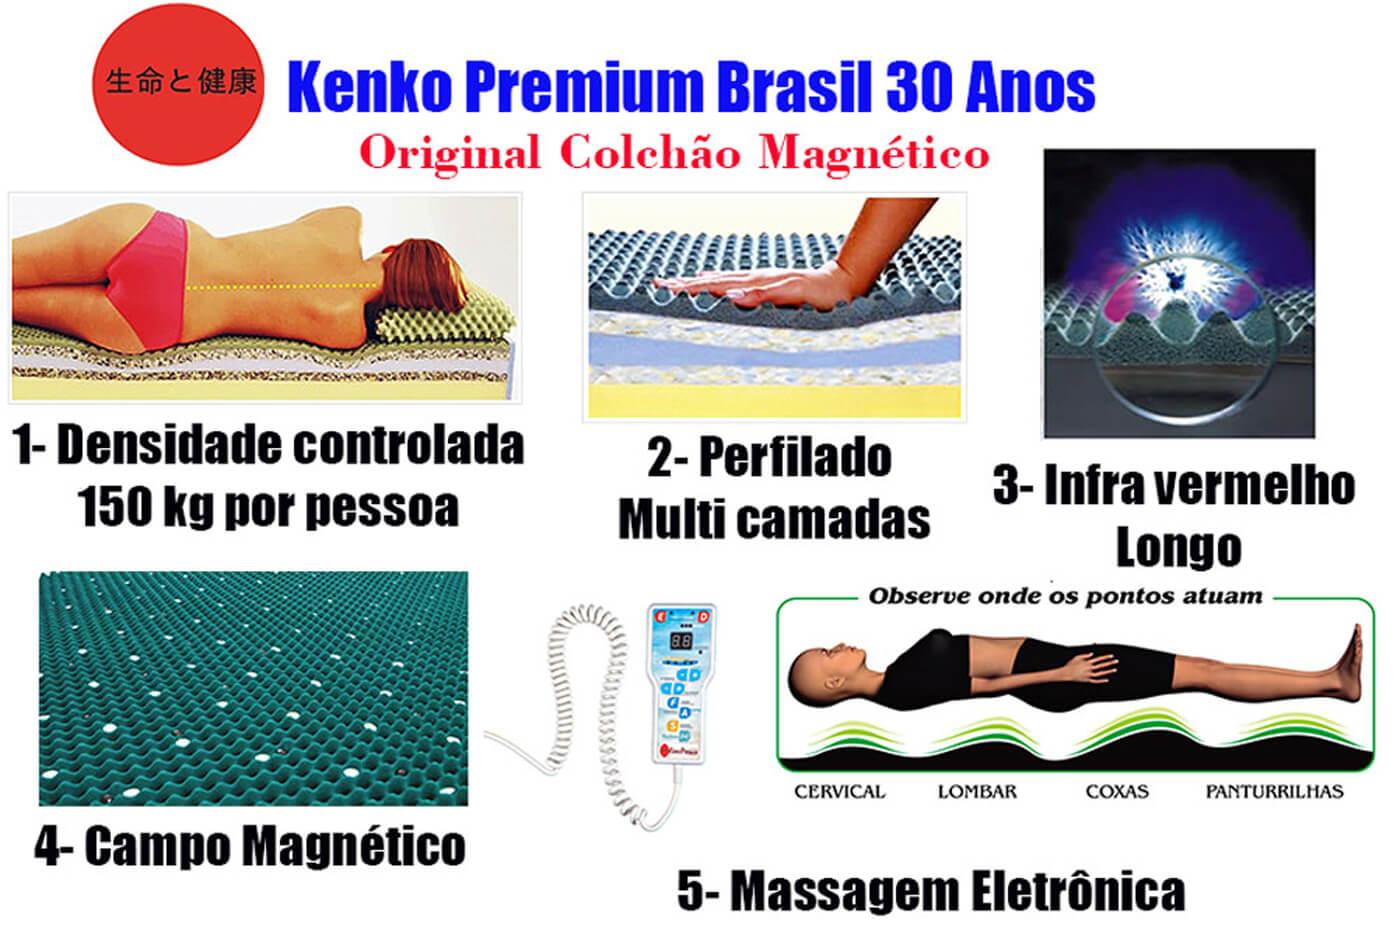 Colchão Magnético Kenko Premium King Size 1,93x2,03x27cm Plus C/ Massagem Eletrônica Energia Bioquãntica + Cromoterapia  - Kenko Premium Colchões